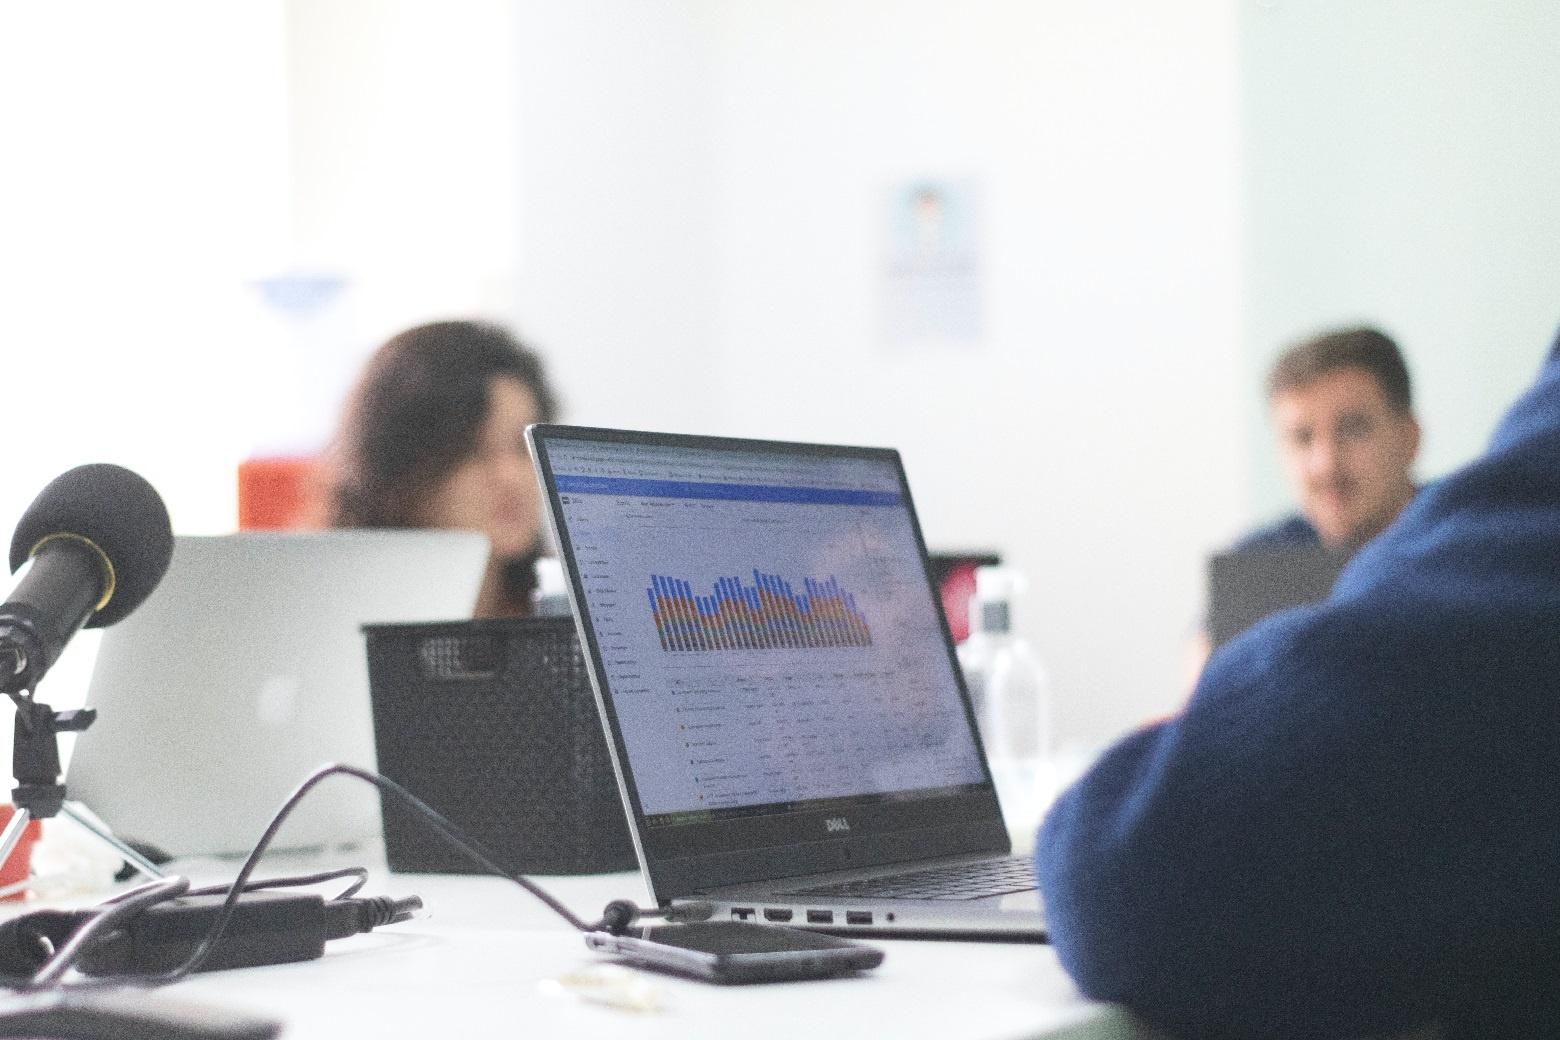 Microphone Zoom Meeting, Google Meet dan Jitsi Terbaik menurut Sound Engineer